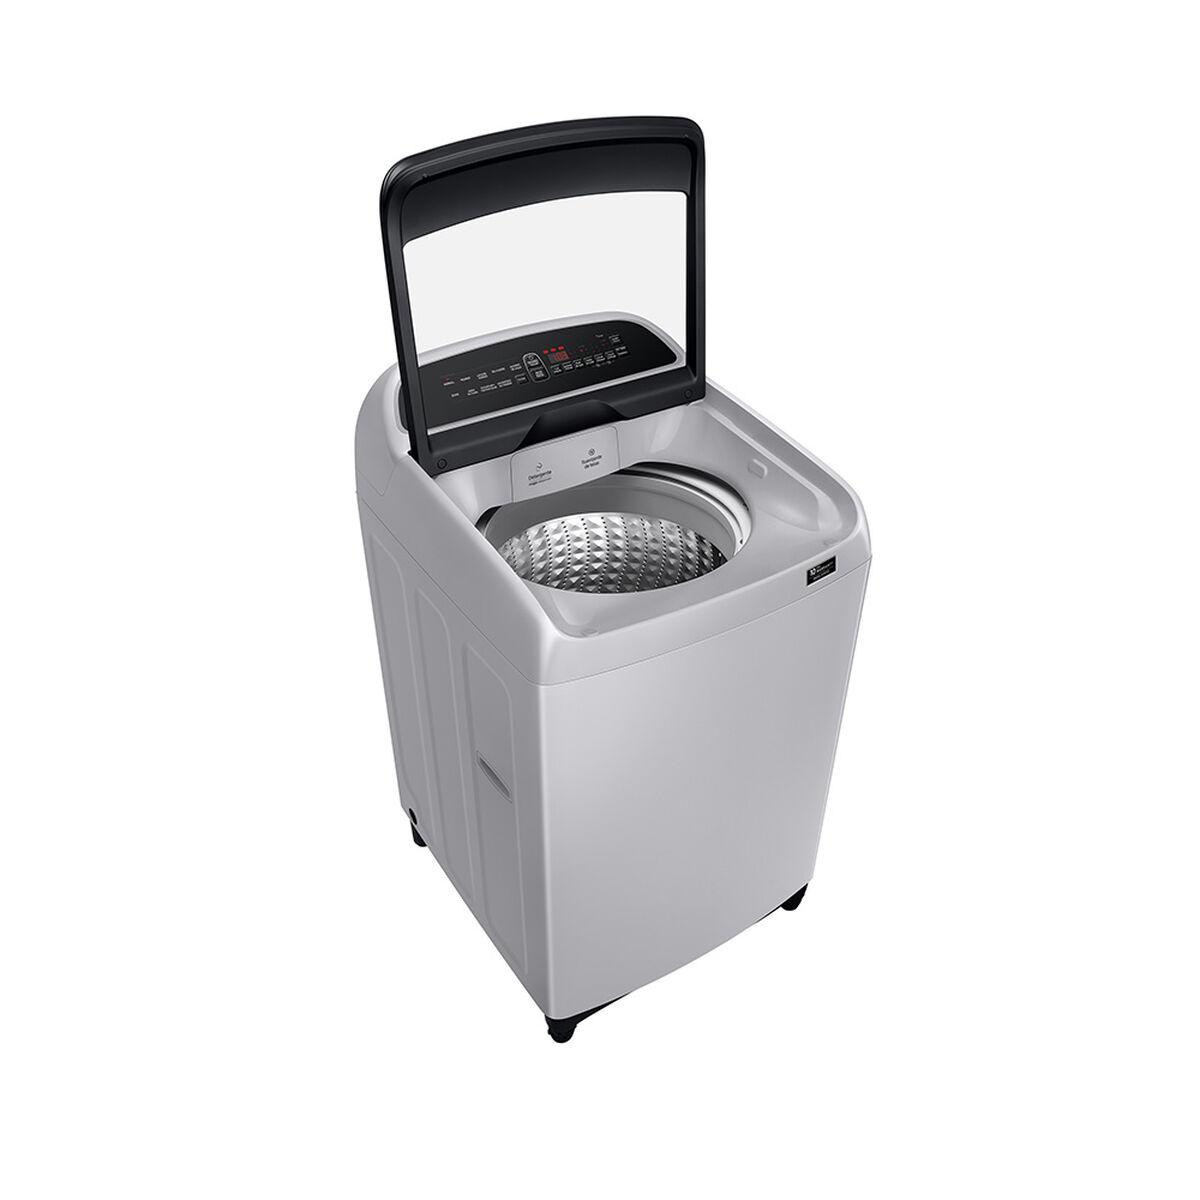 Lavadora Automática Samsung WA13T5260BY/ZS 13 kg.